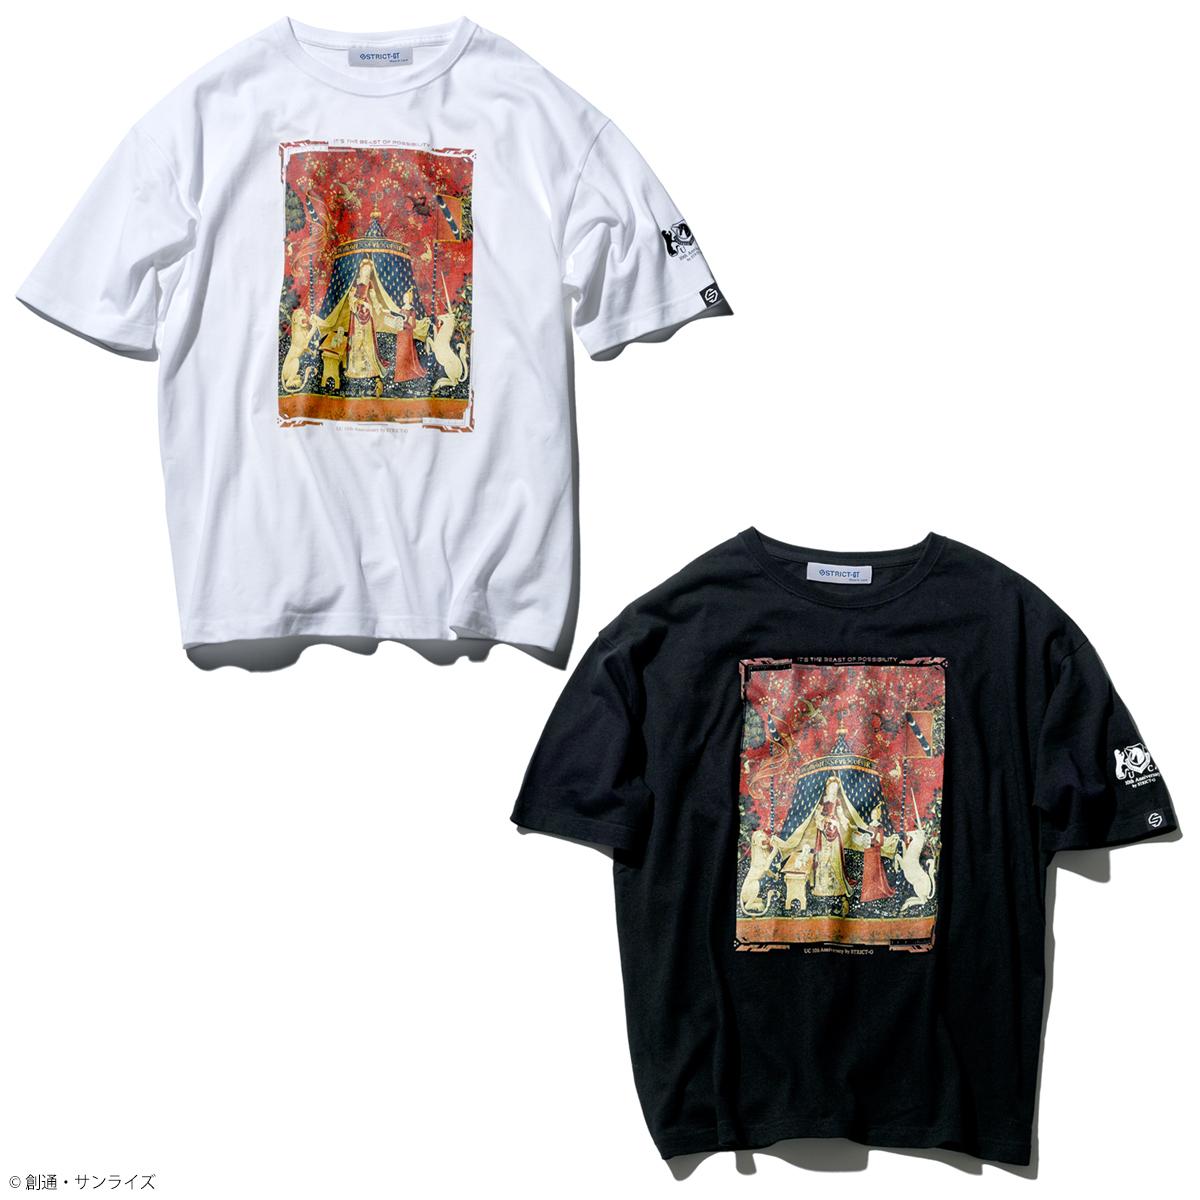 STRICT-G『機動戦士ガンダムUC』 OVA10周年記念 ビッグTシャツ タペストリー柄